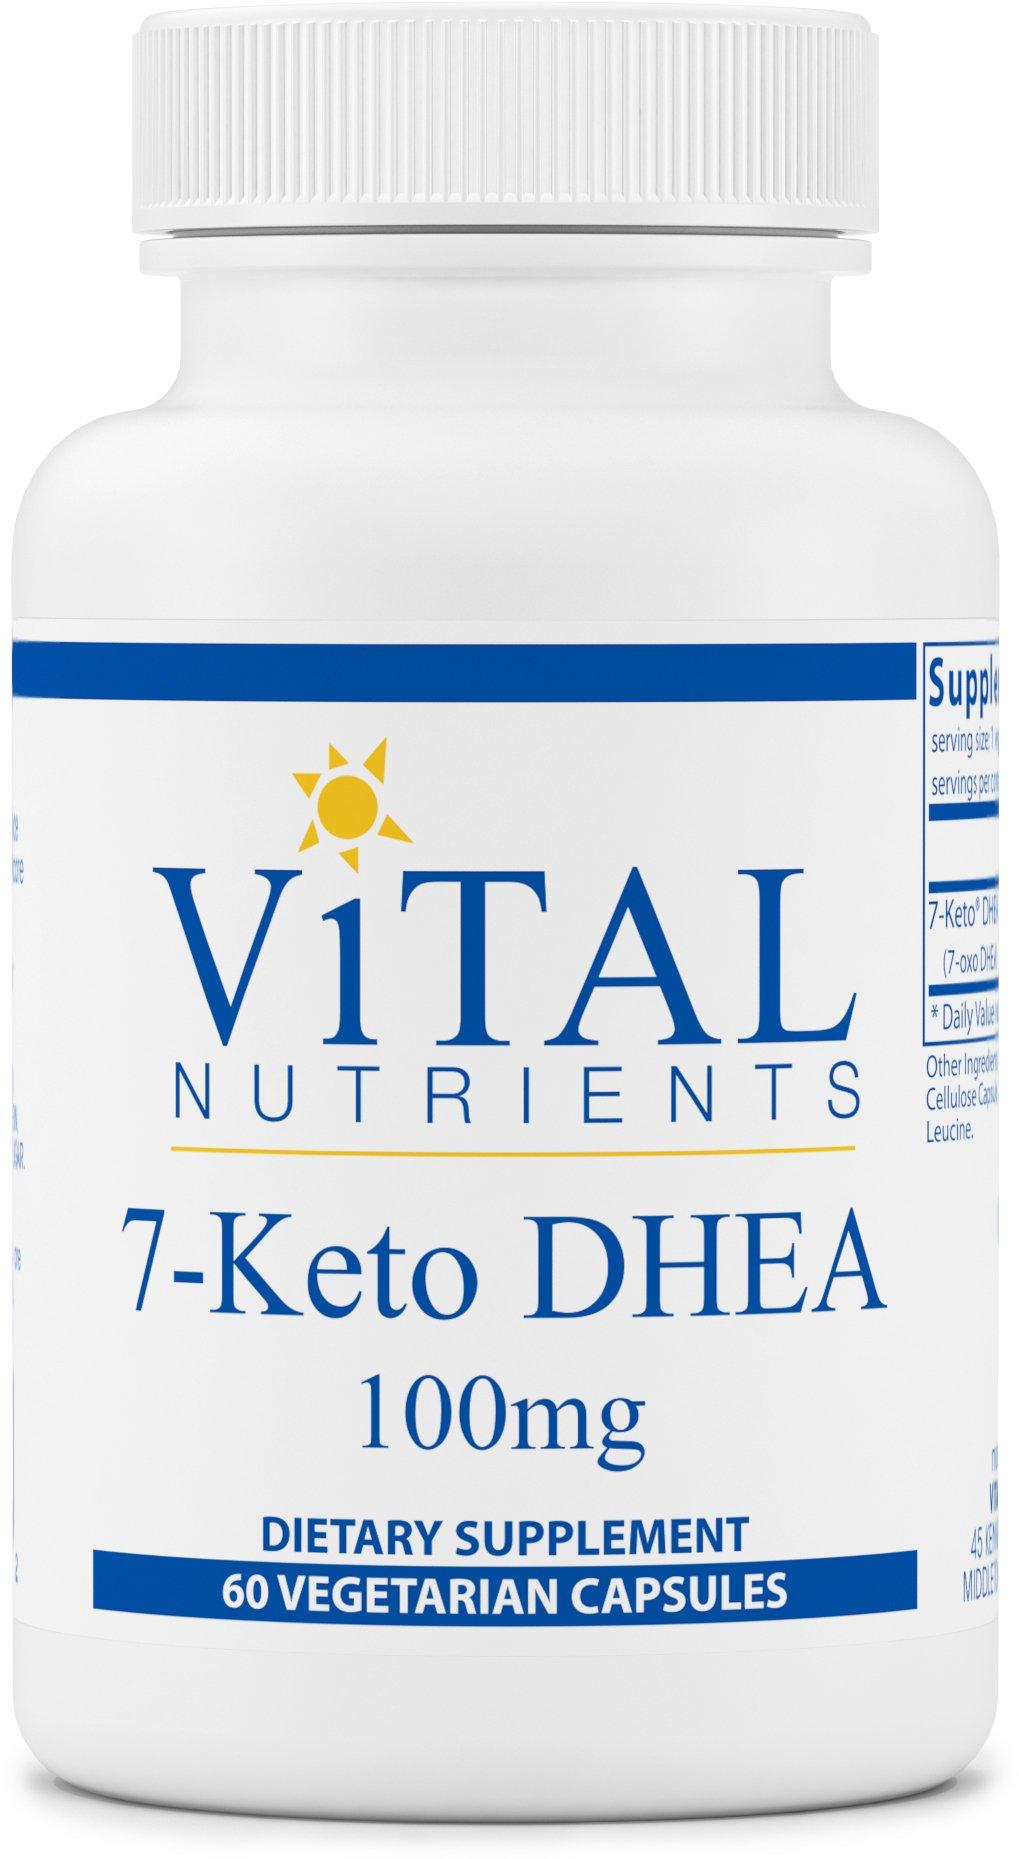 Vital Nutrients - 7-Keto DHEA 100 mg - Natural Metabolite Promoting Healthy RMR - 60 Capsules